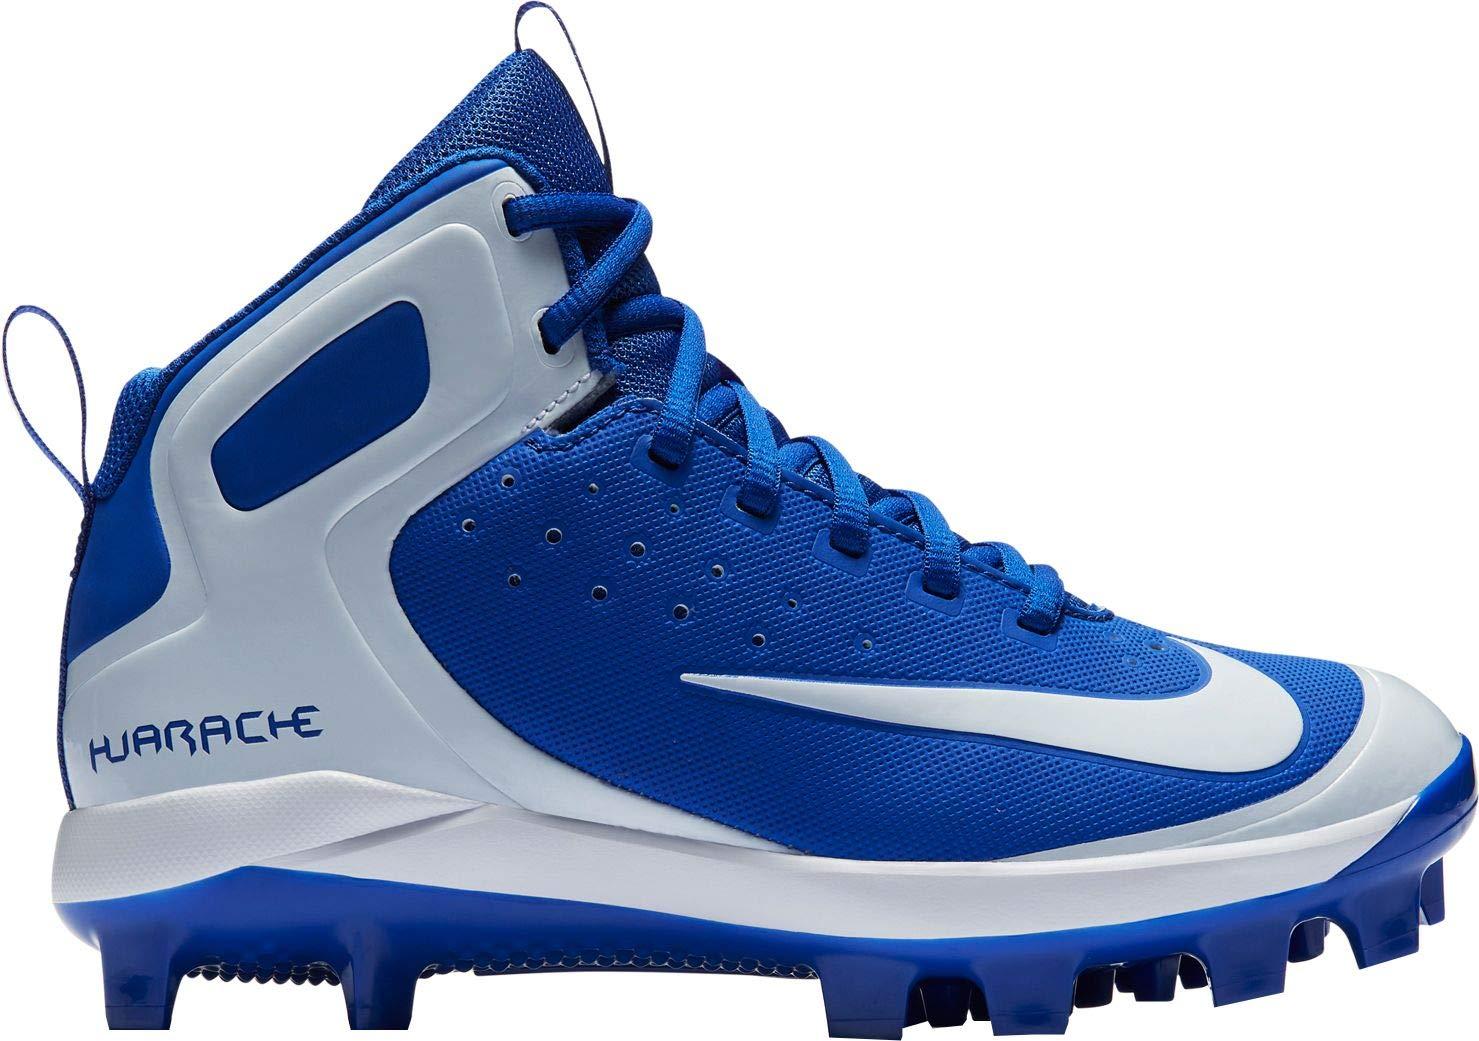 Nike Kids' Alpha Huarache Pro Mid Baseball Cleats (Blue/White, 5.5 M US) by Nike